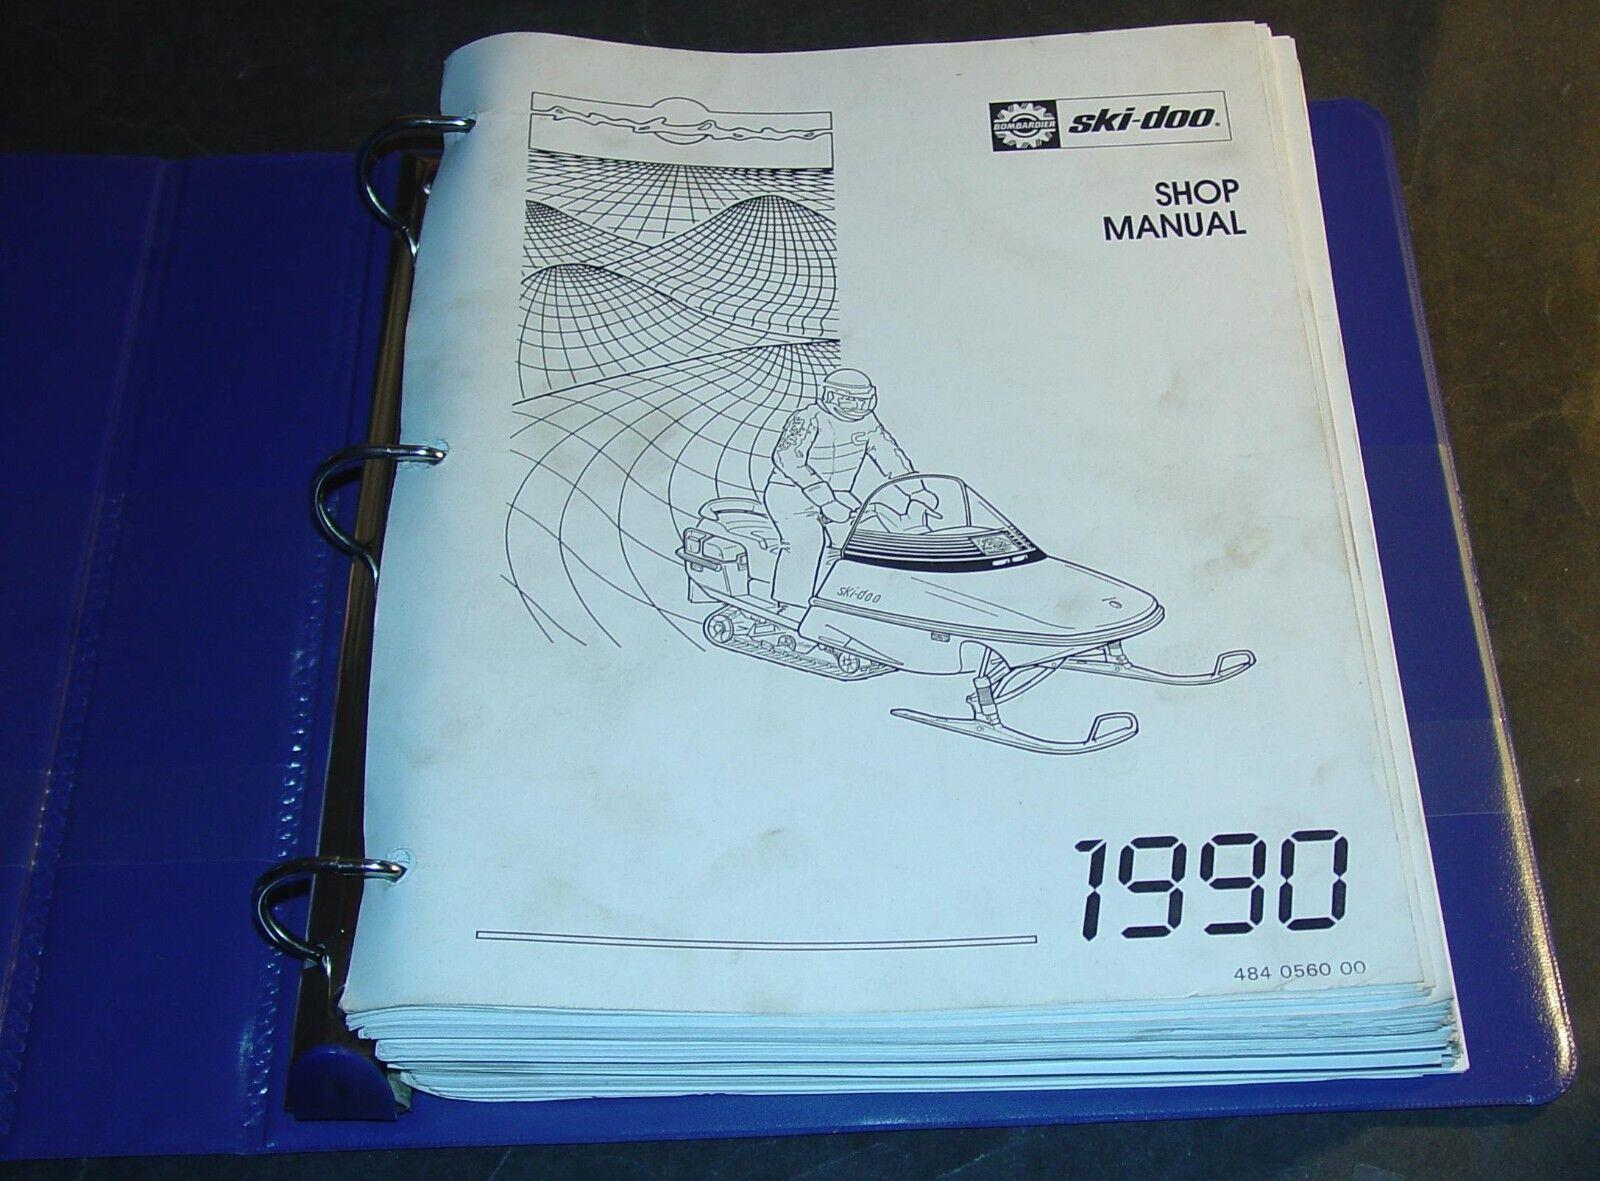 1990 SKI-DOO SNOWMOBILE SHOP SERVICE MANUAL P/N 484 0560 00 (459